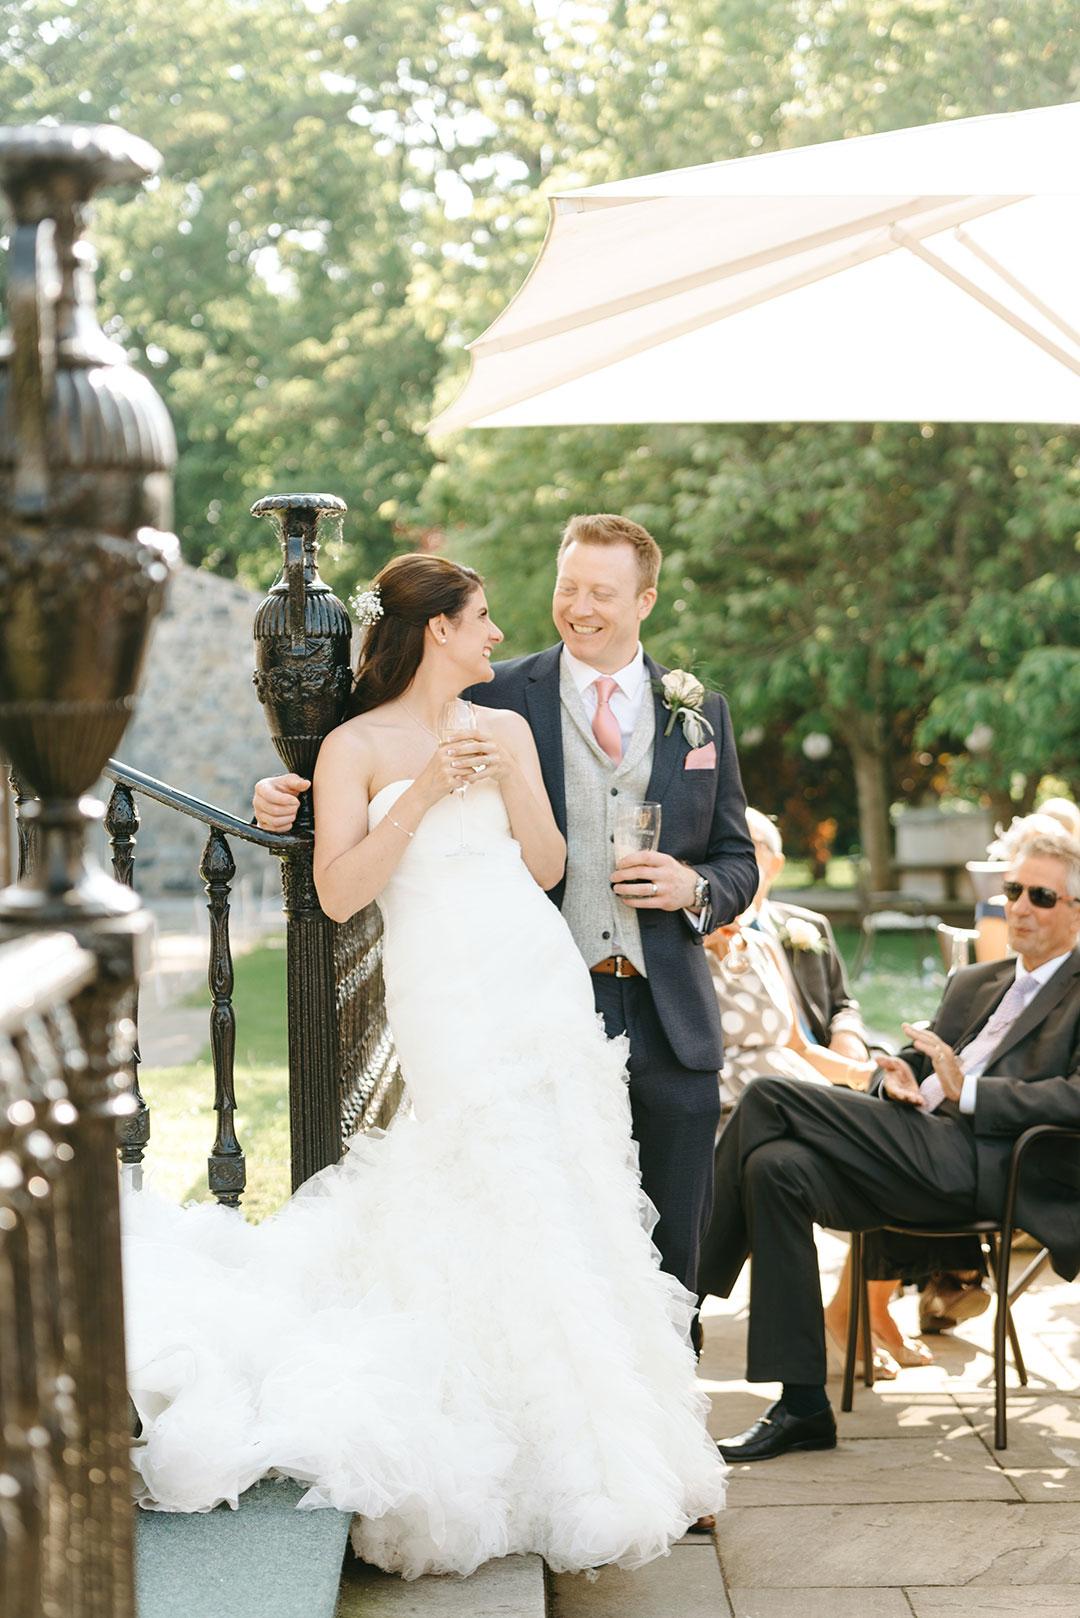 bellinter-house-wedding-photographer-0126_0126.jpg